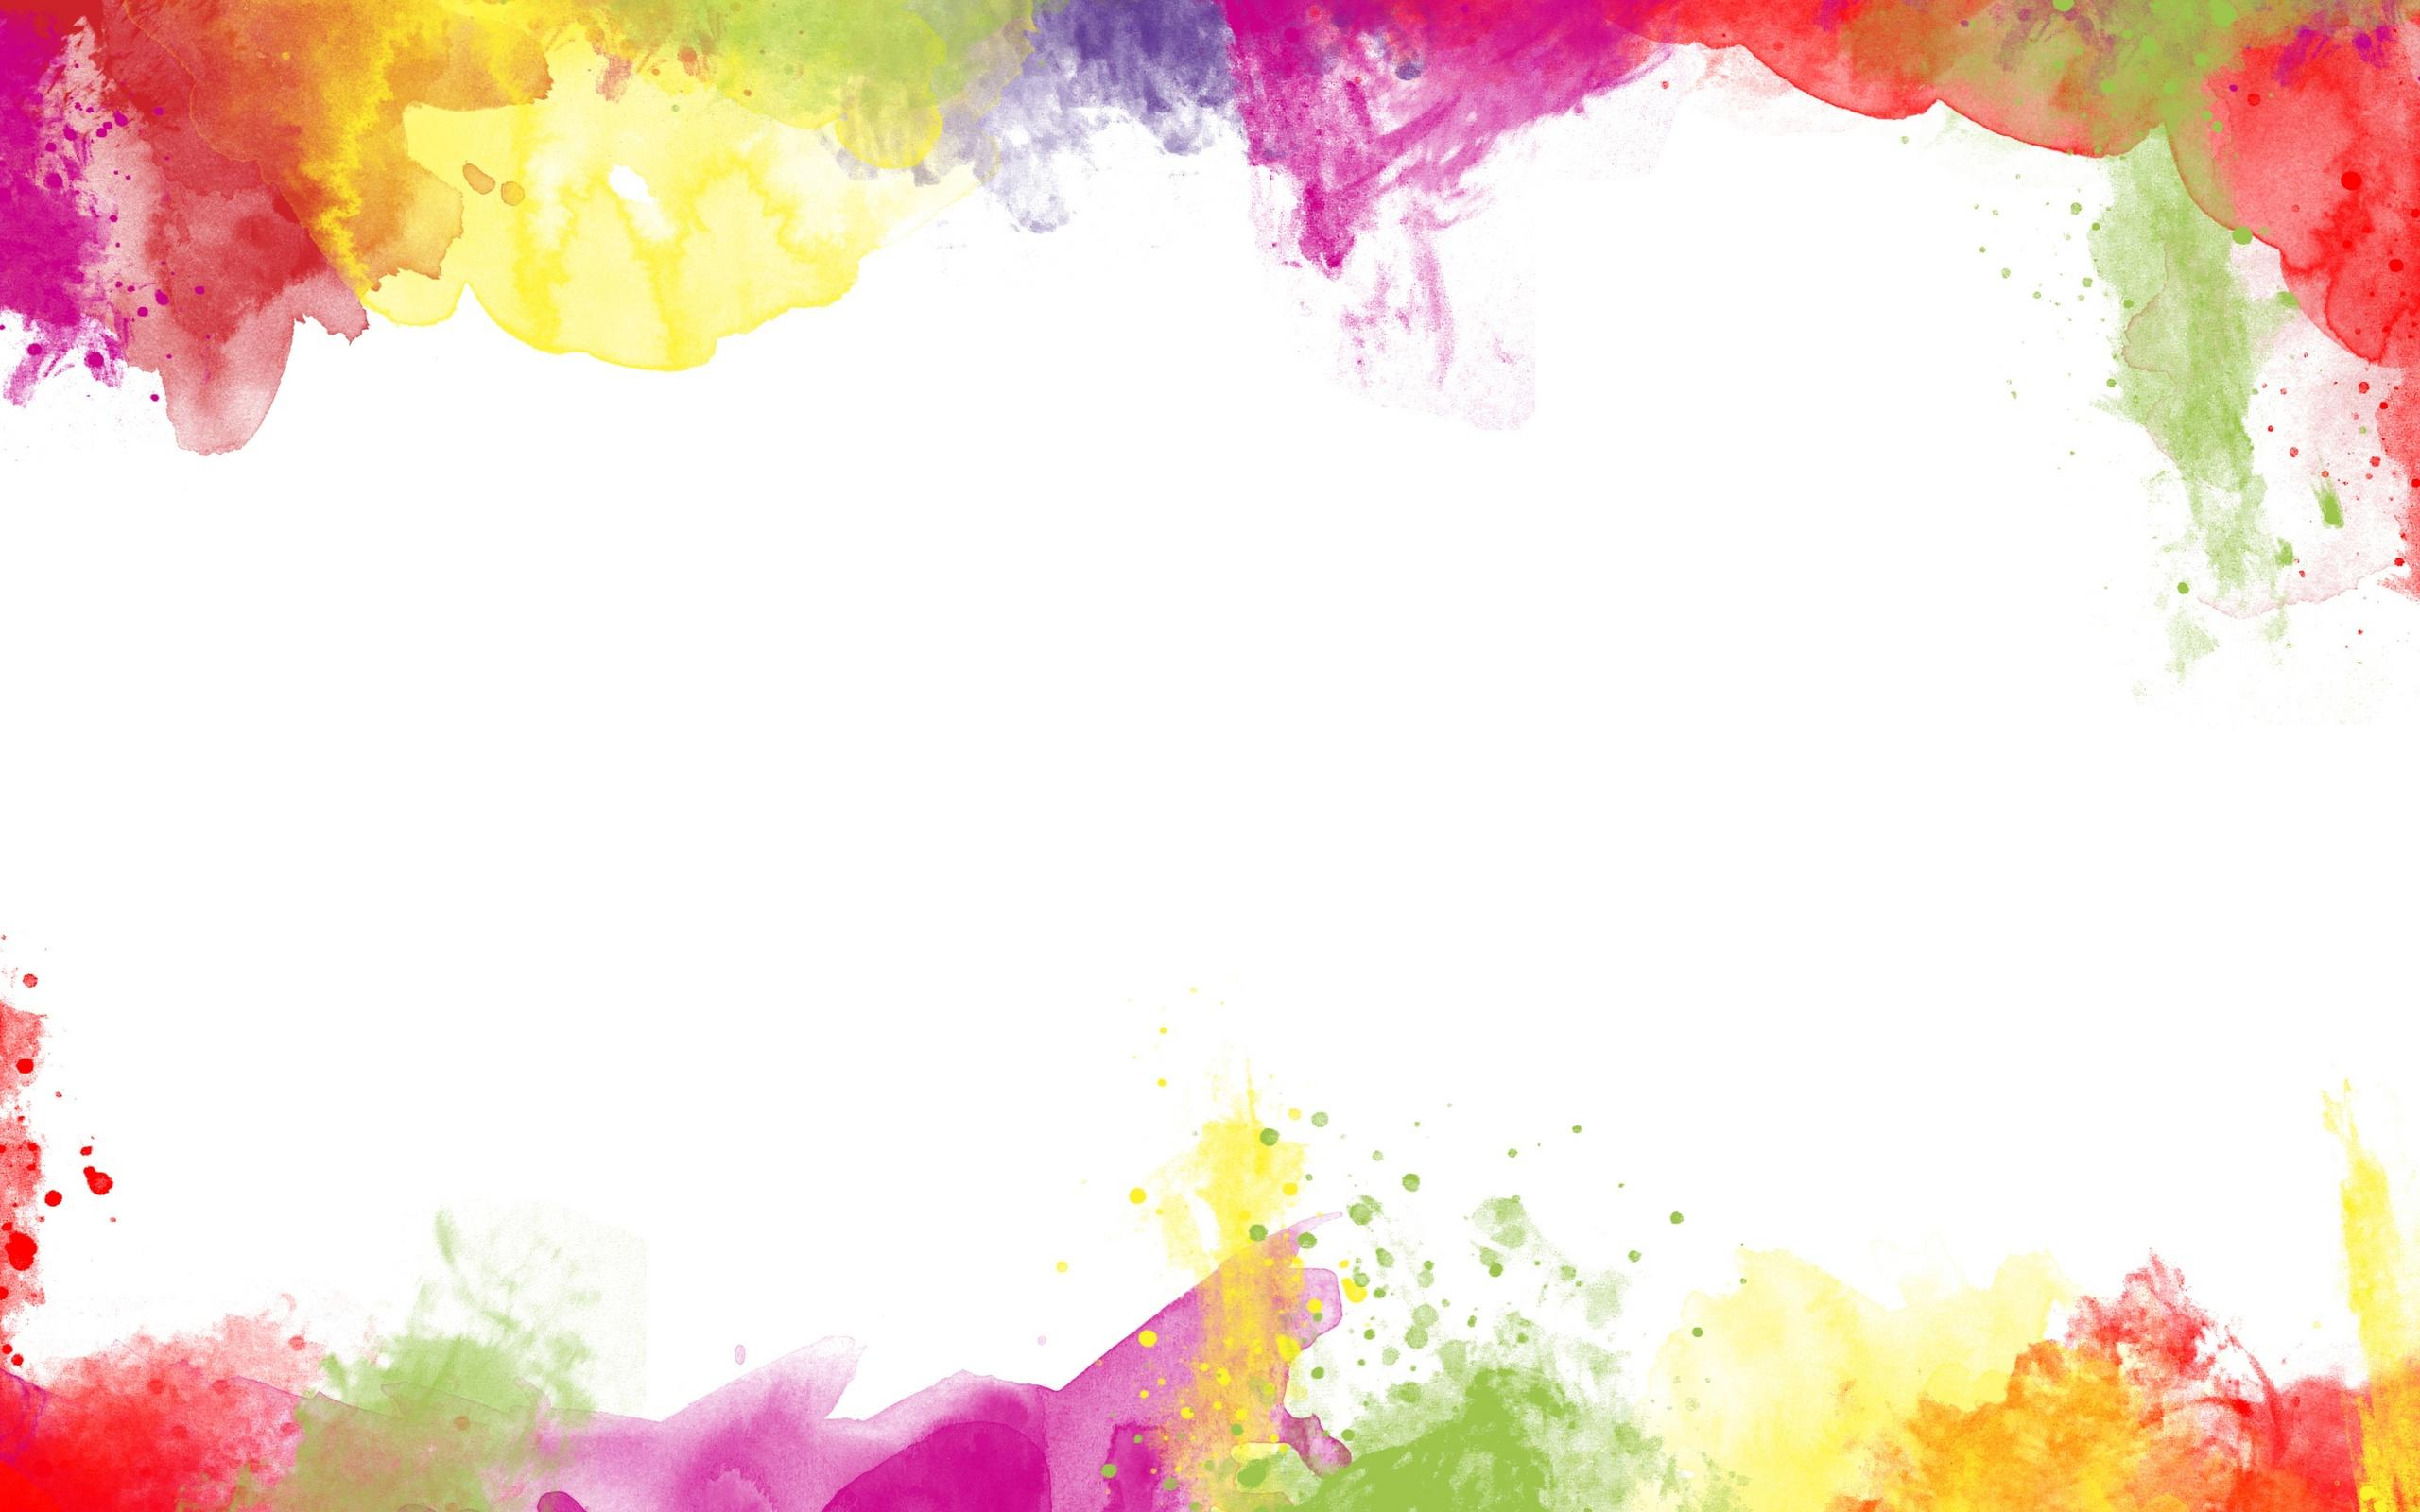 Hd Christmas Wallpapers 1080p Paint Wallpaper 9596 Hdwpro